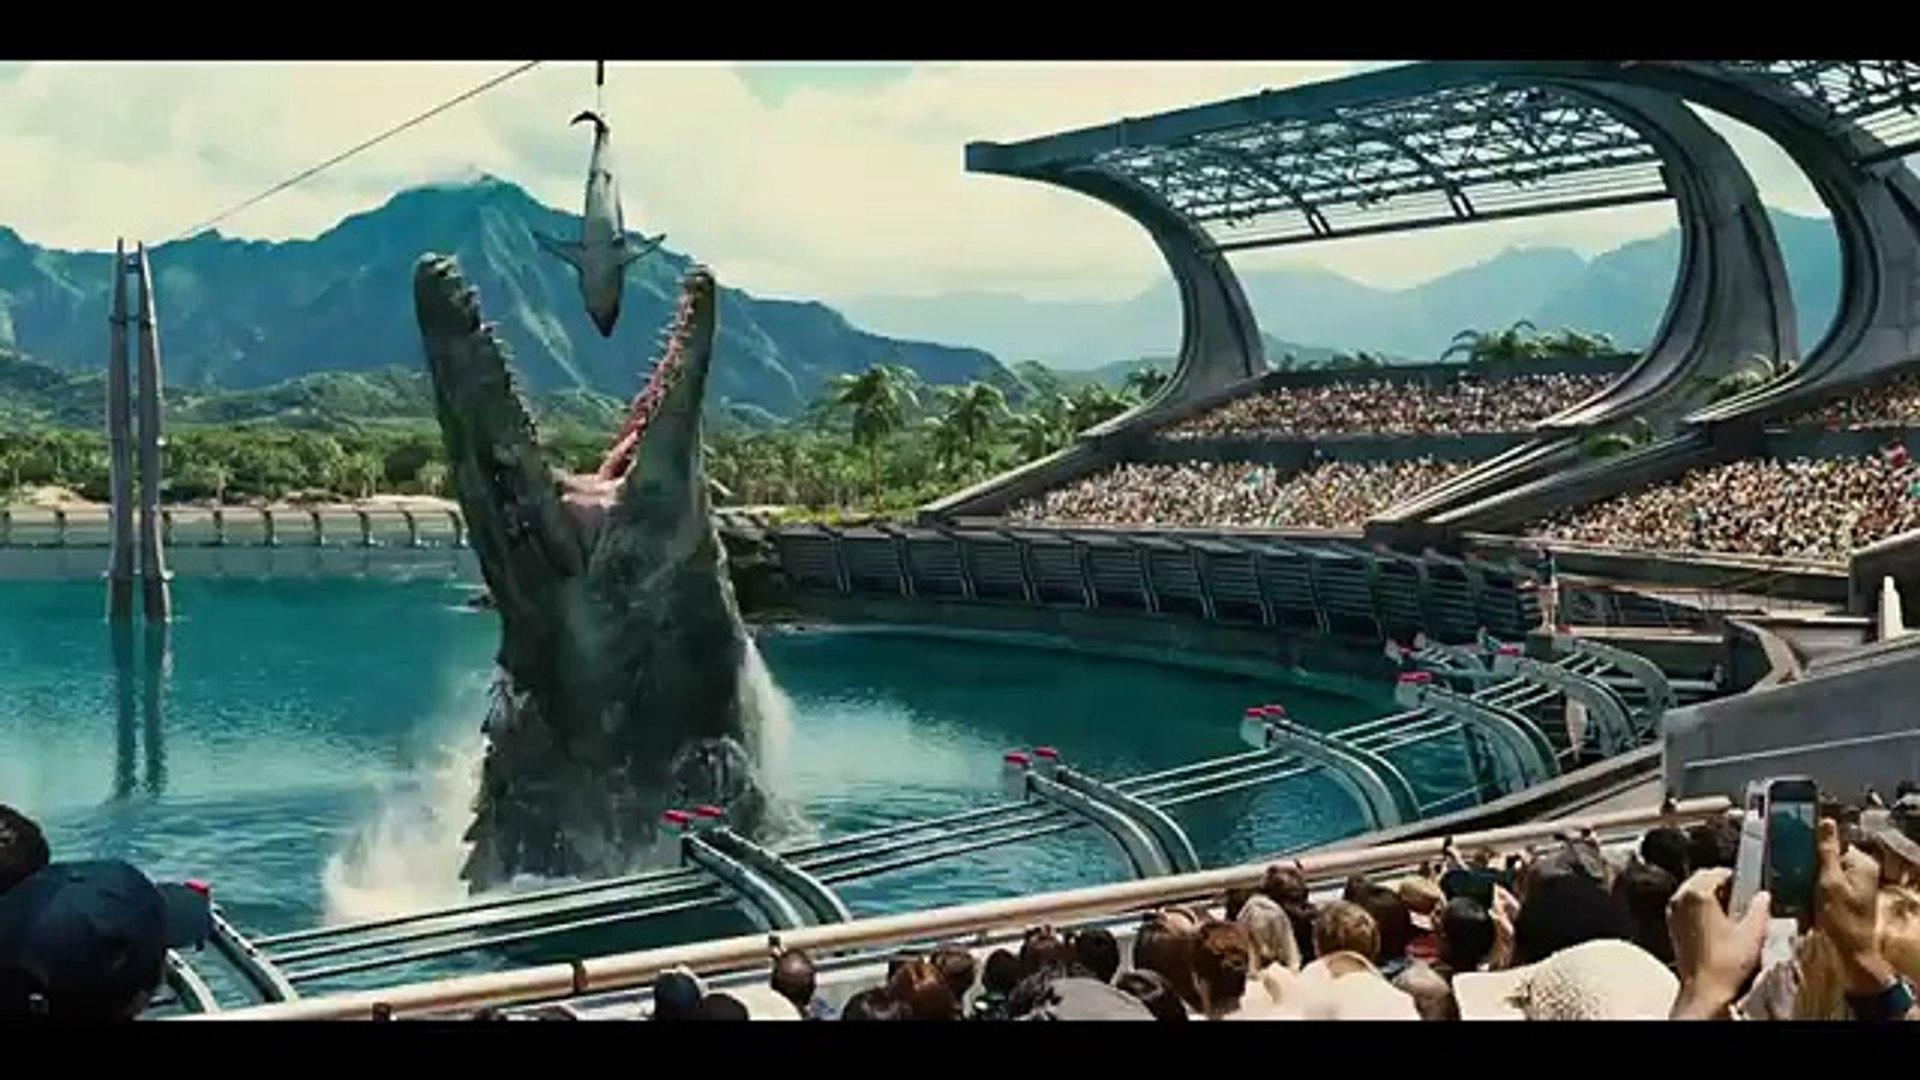 Jurassic World Official Super Bowl TV Spot (2015) - New jurassic park movie - movie trailers - Chris